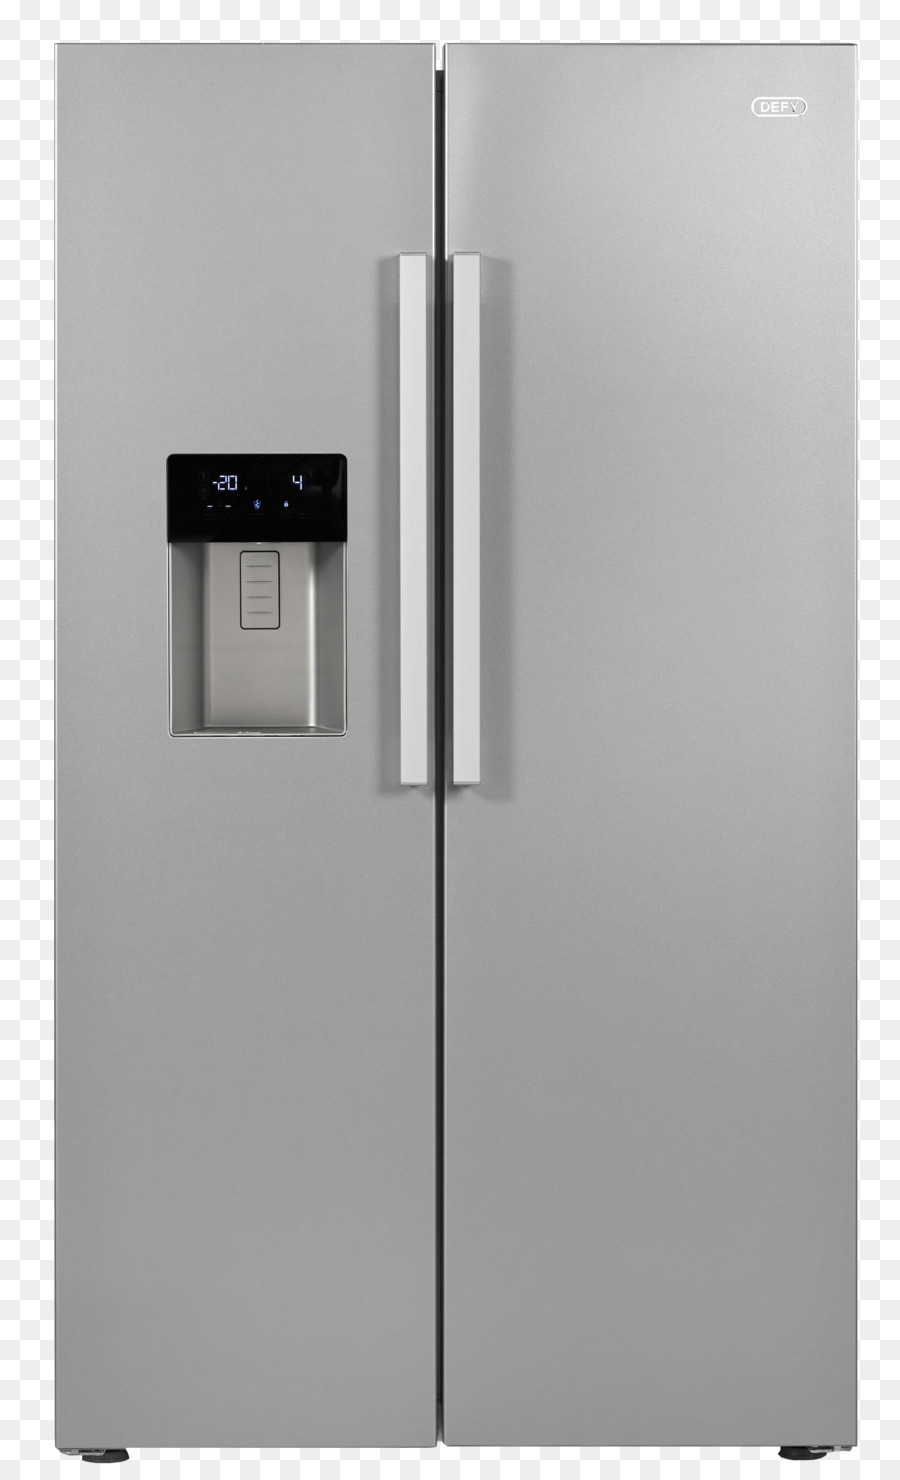 Refrigerator Home appliance Defy Appliances Major appliance Auto ...